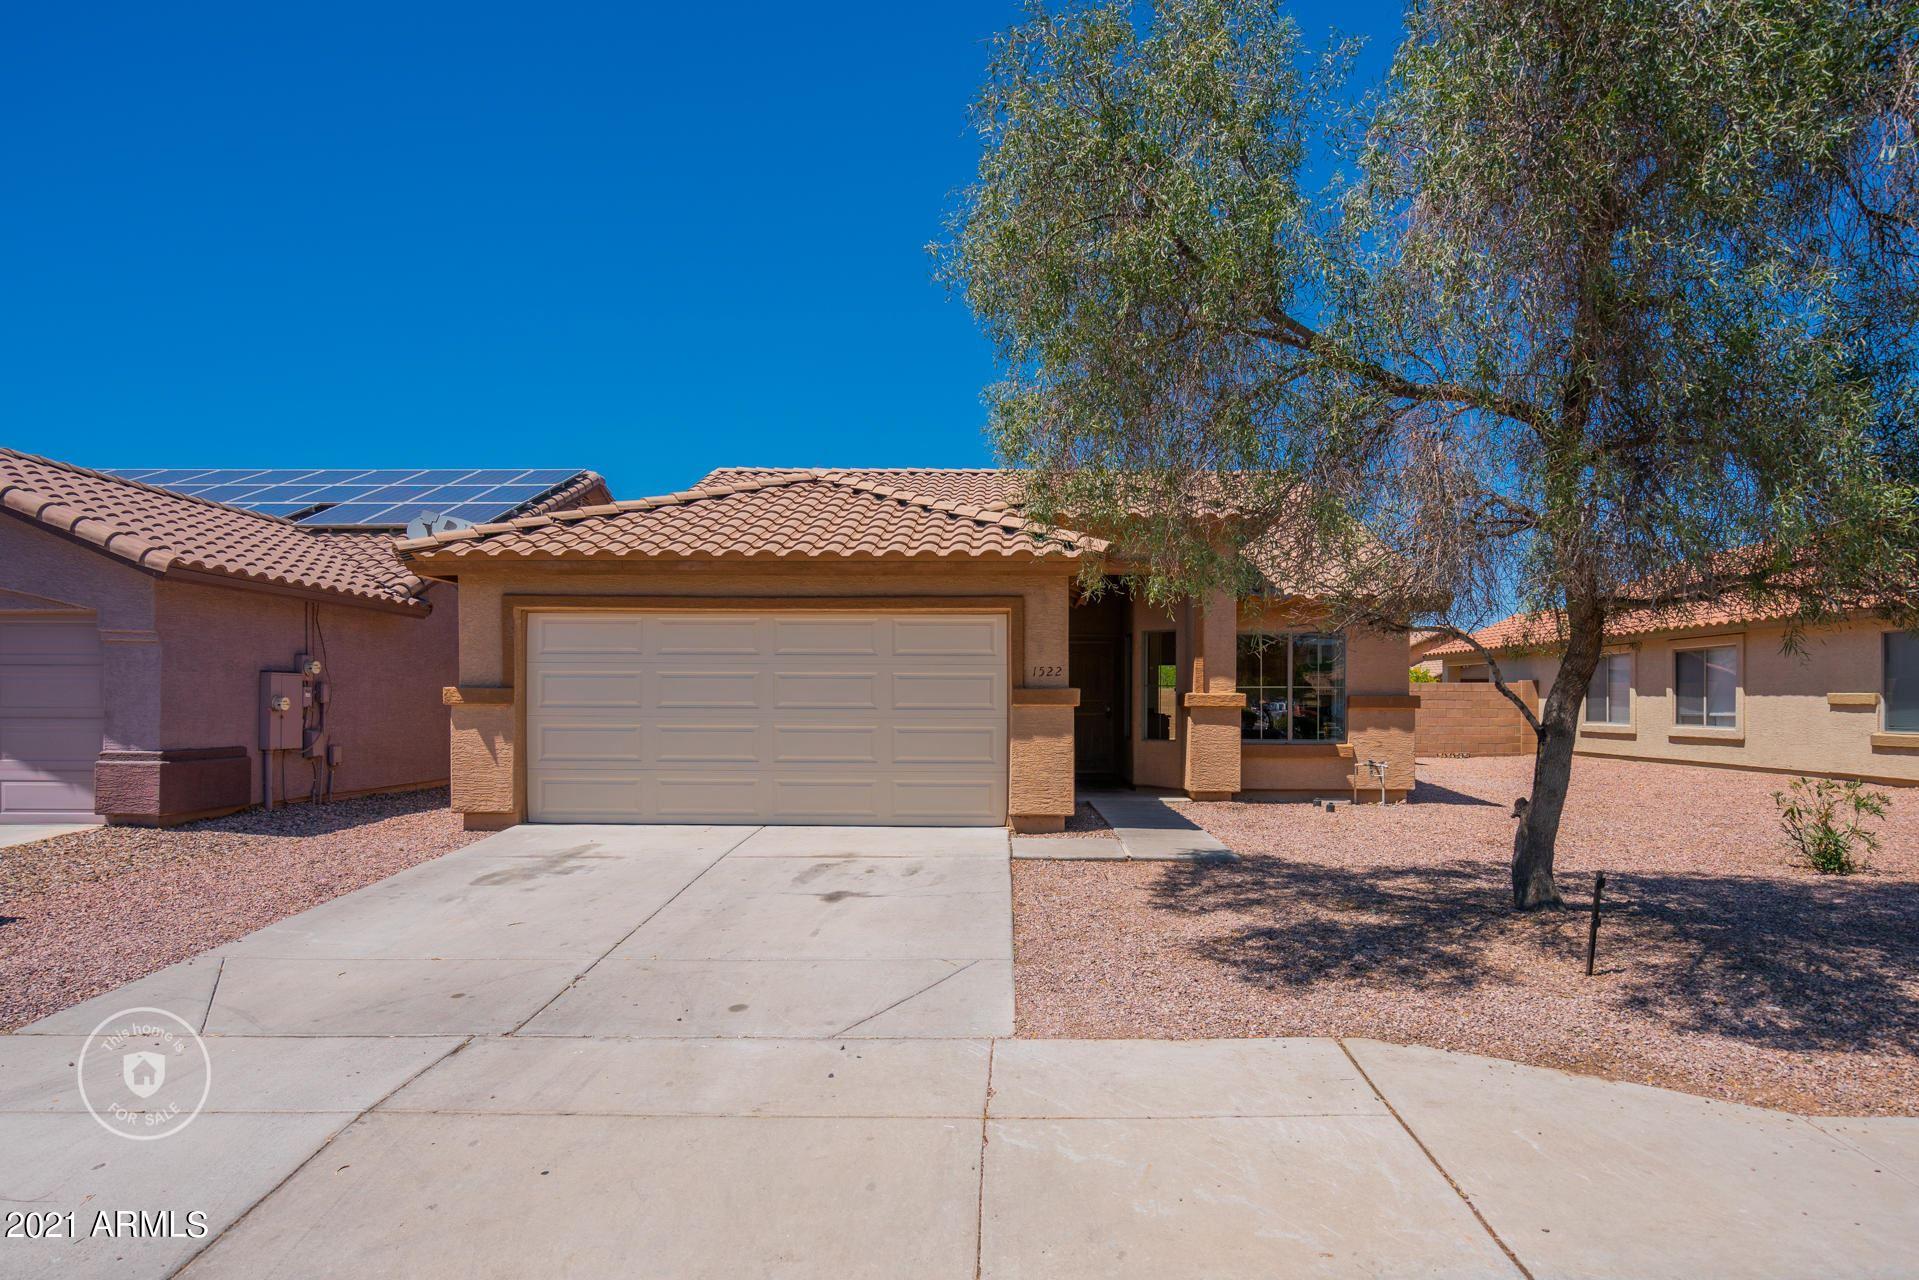 1522 E CHAMBERS Street, Phoenix, AZ 85040 - MLS#: 6240150